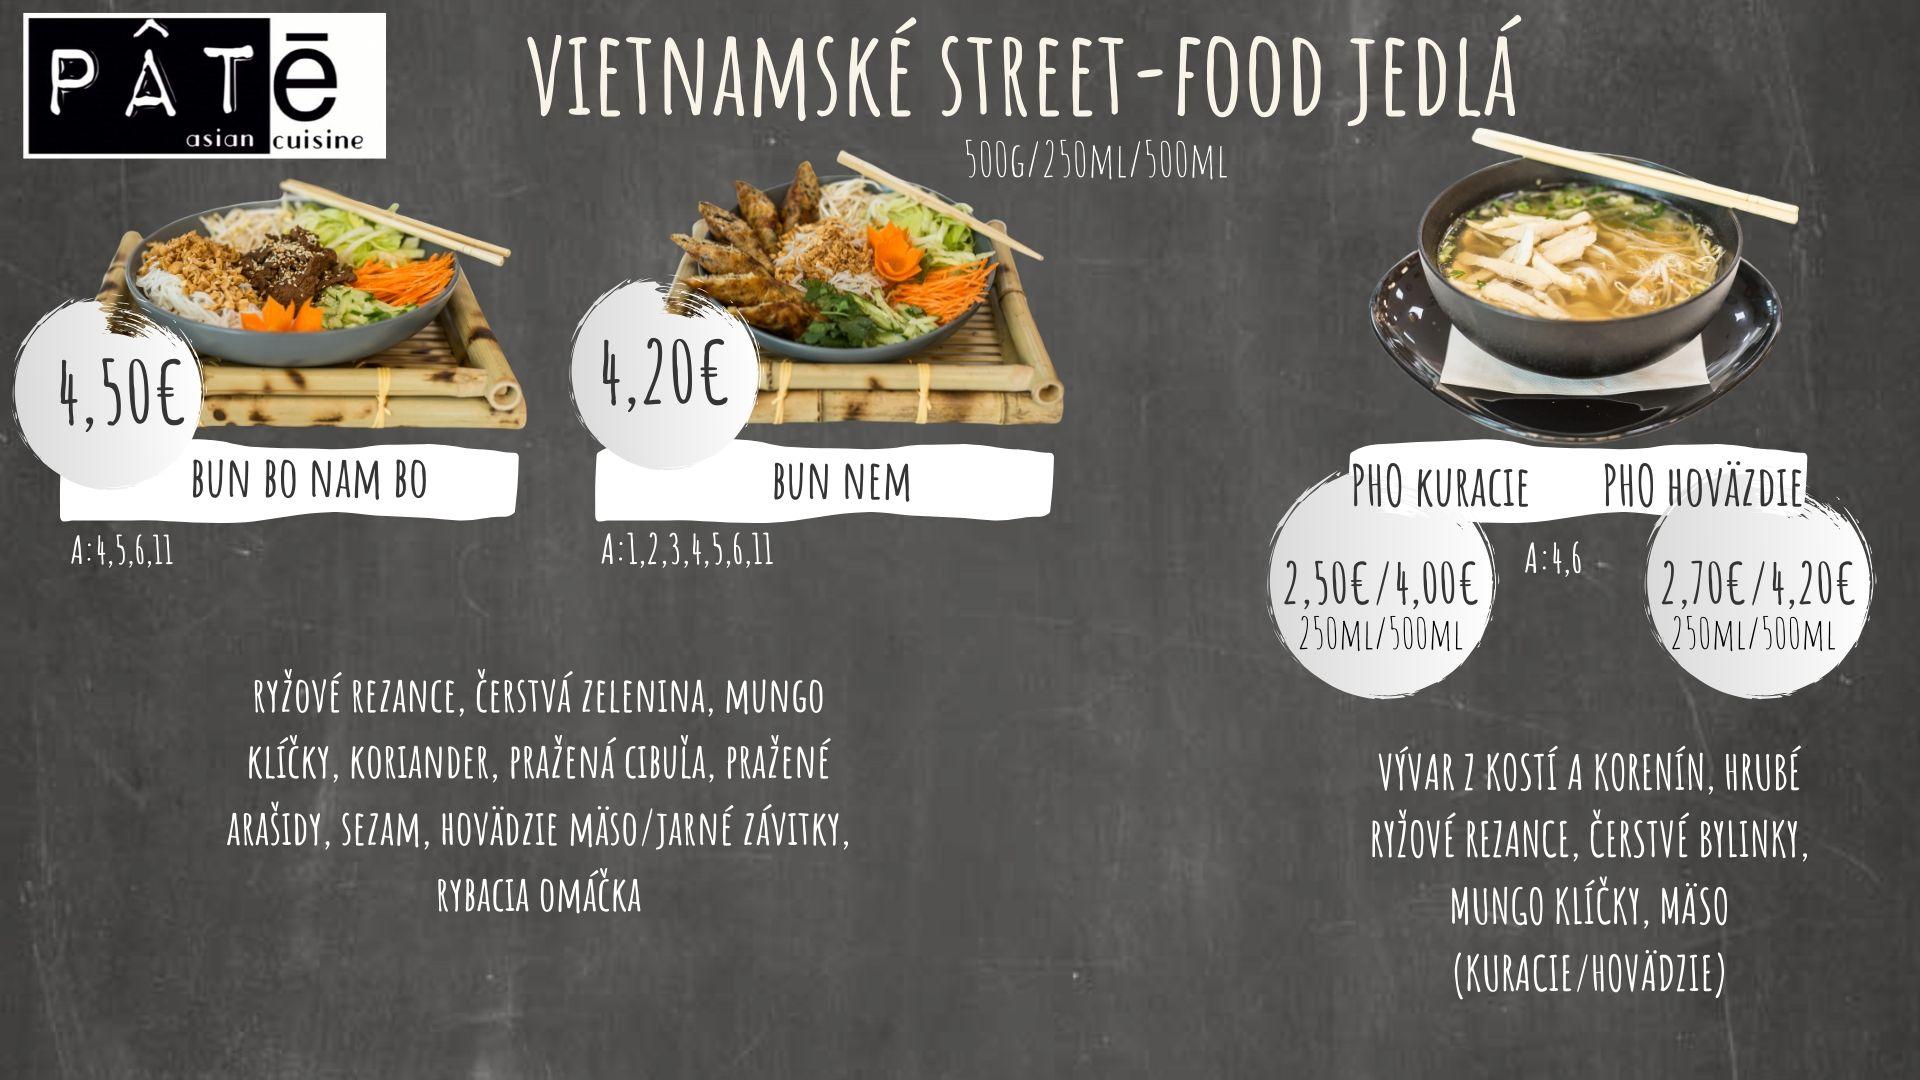 Vietnamské street-food jedlá